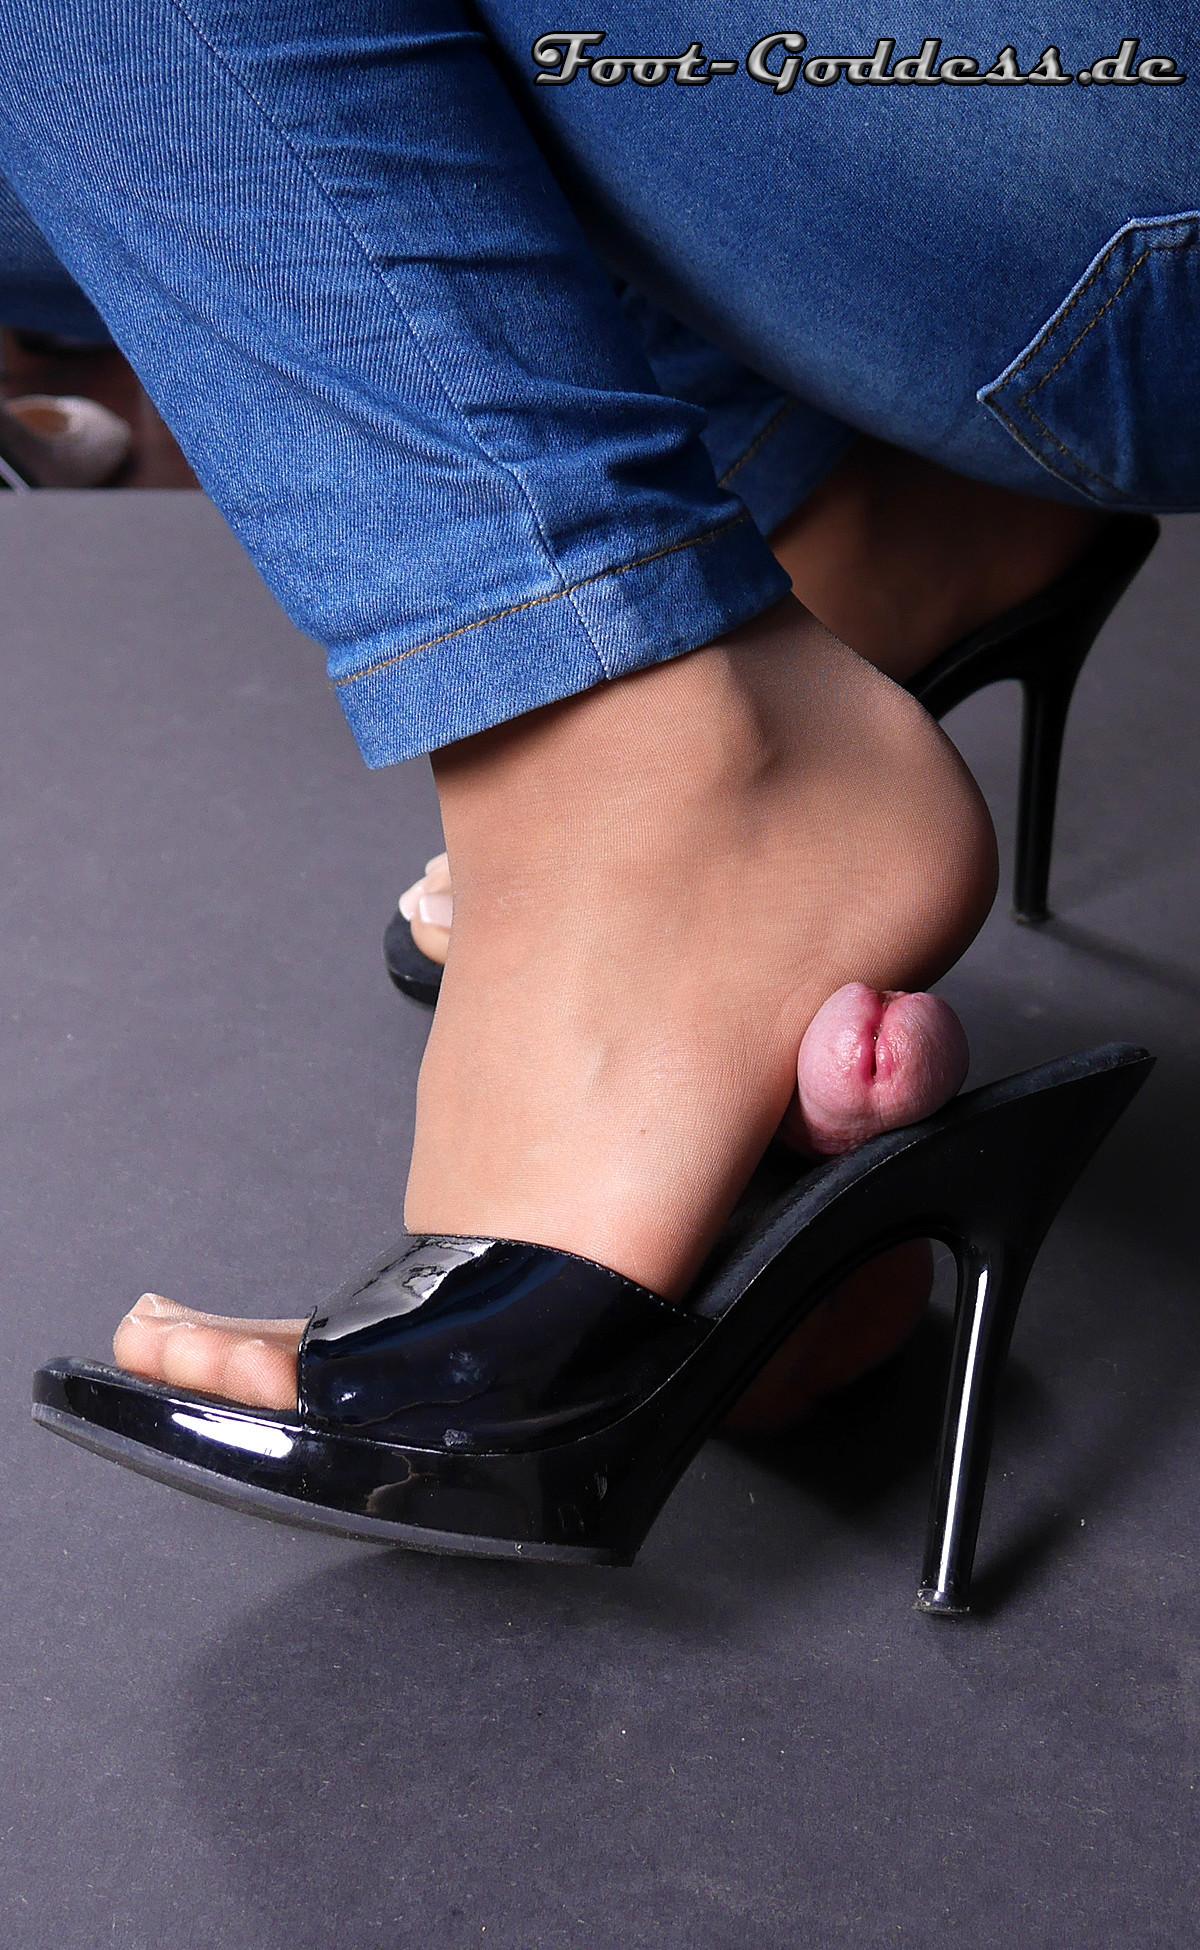 foot-goddess-1-23